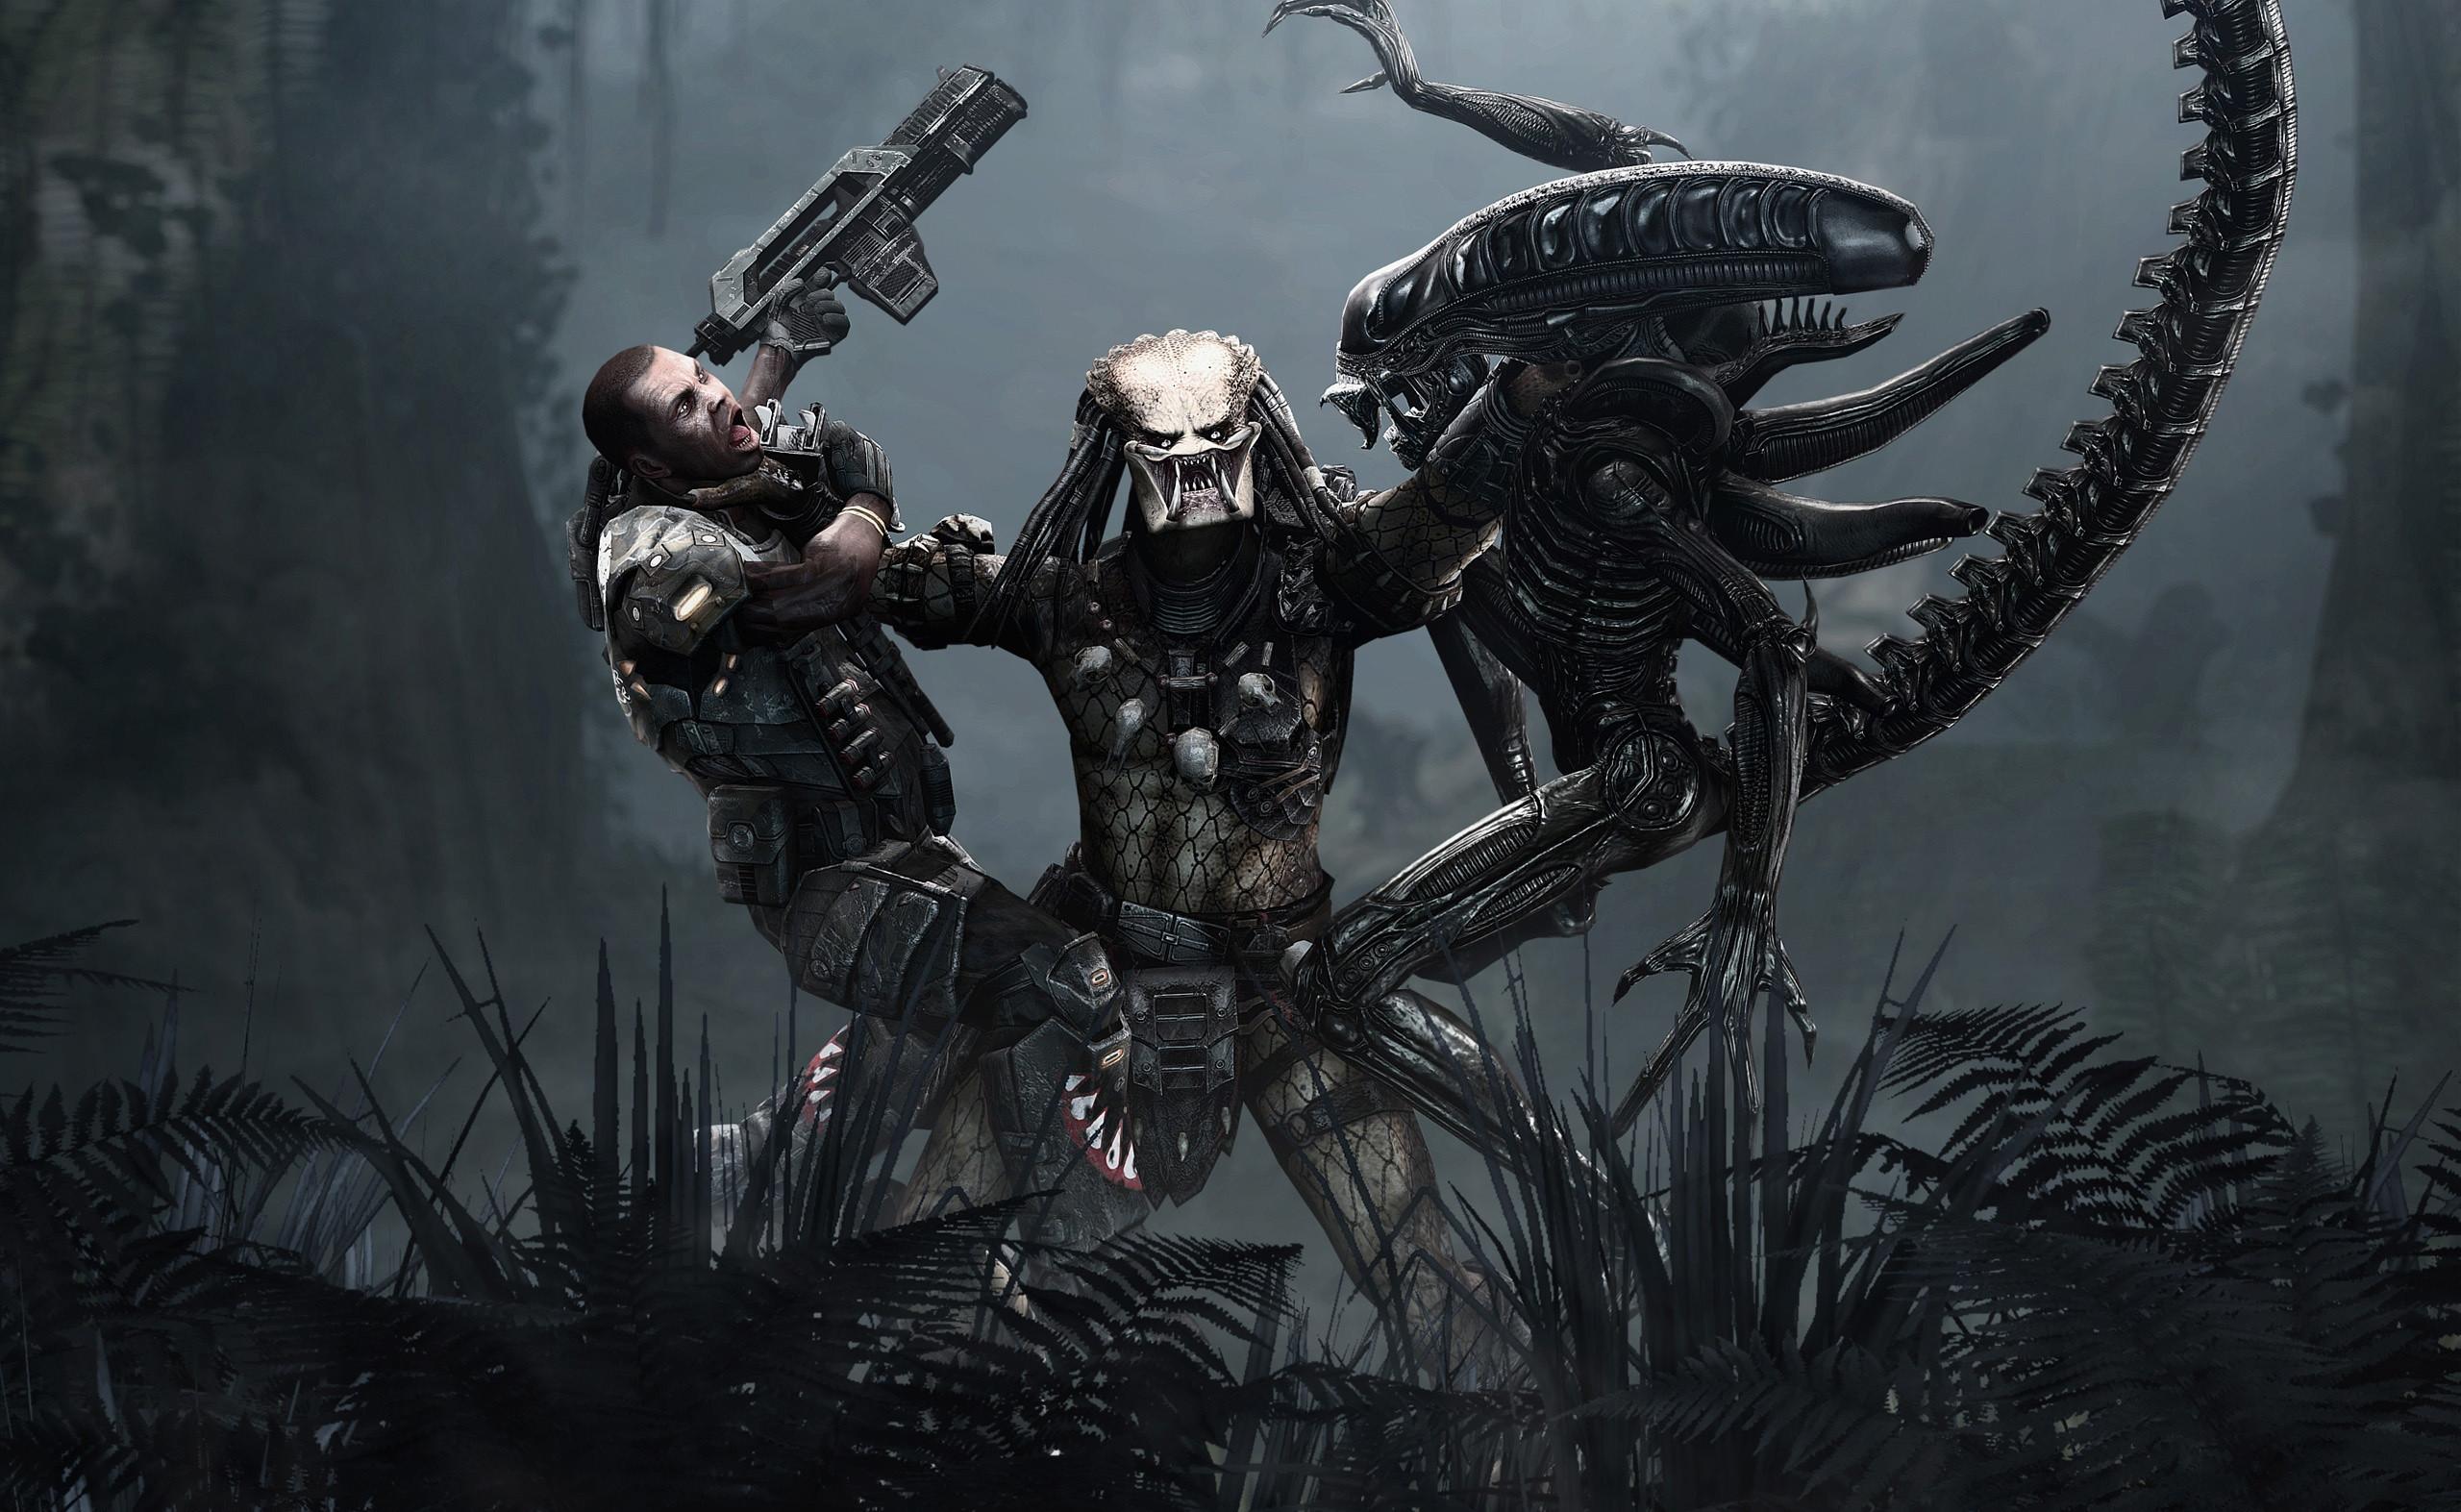 Alien vs predator wallpaper 2560x1573 alien chess predator hd wallpaper background id109601 voltagebd Choice Image